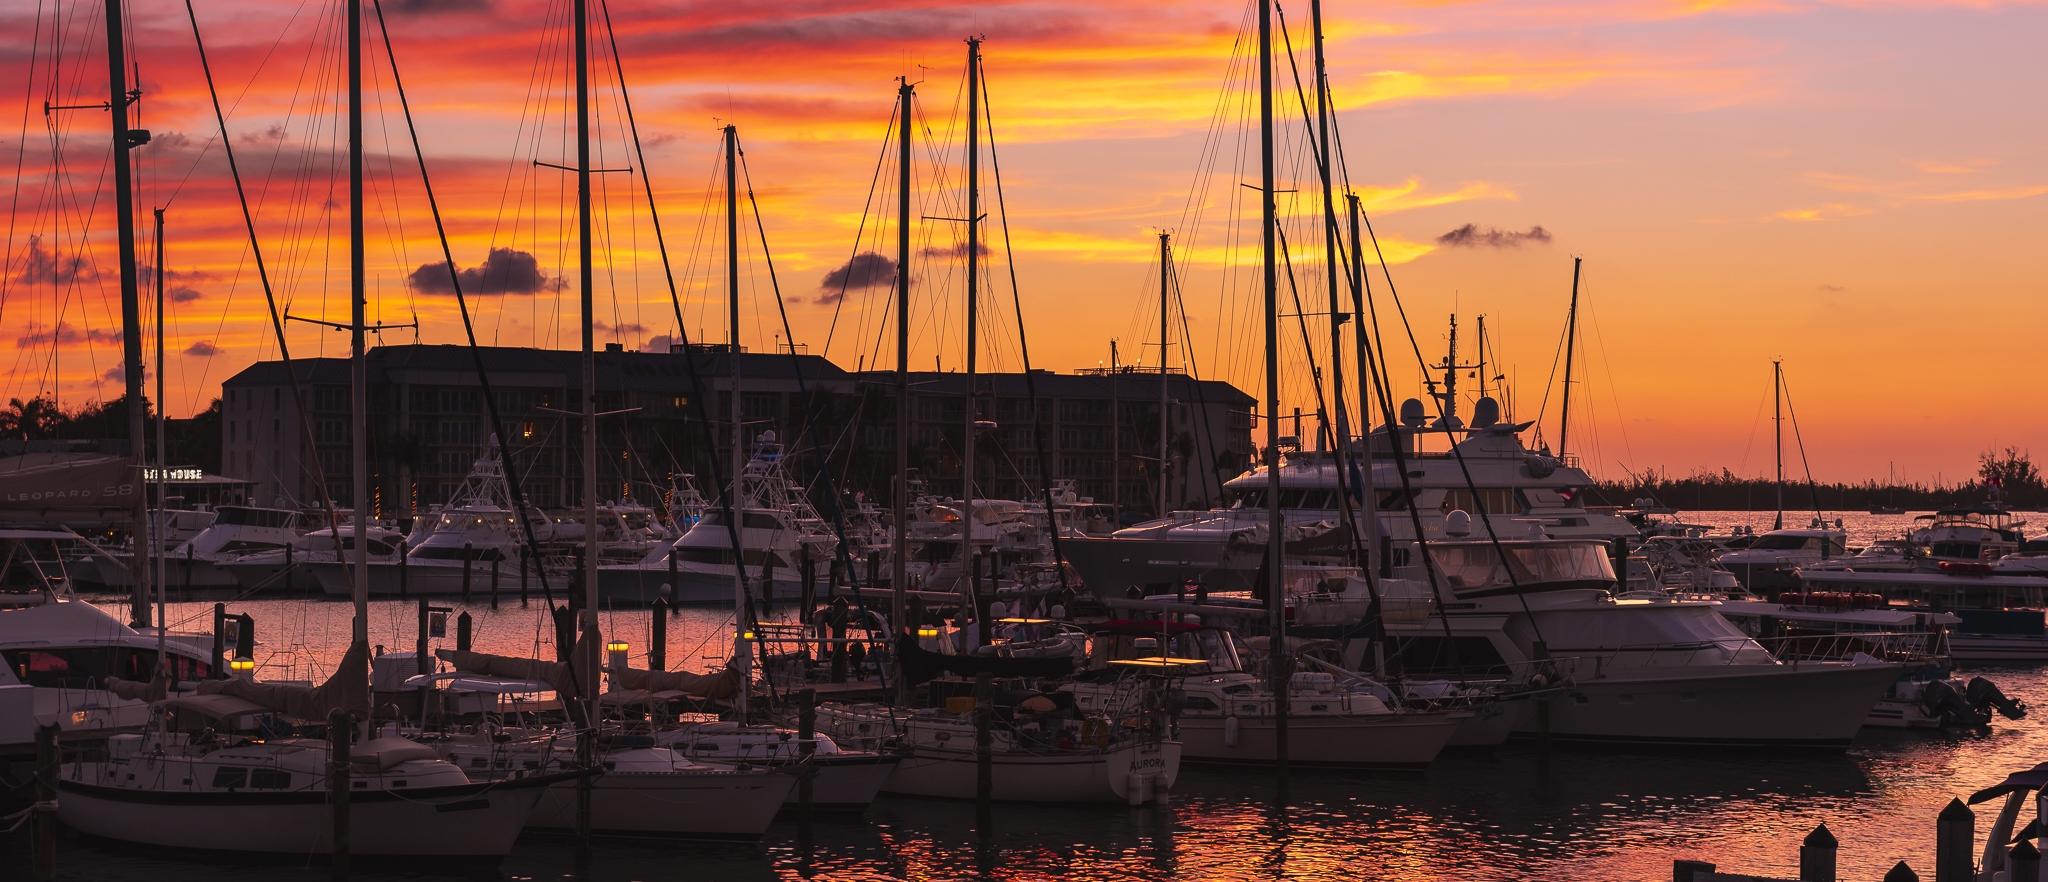 Key-West-Sunset-Nick-Doll-Photography-7165 copy.jpg